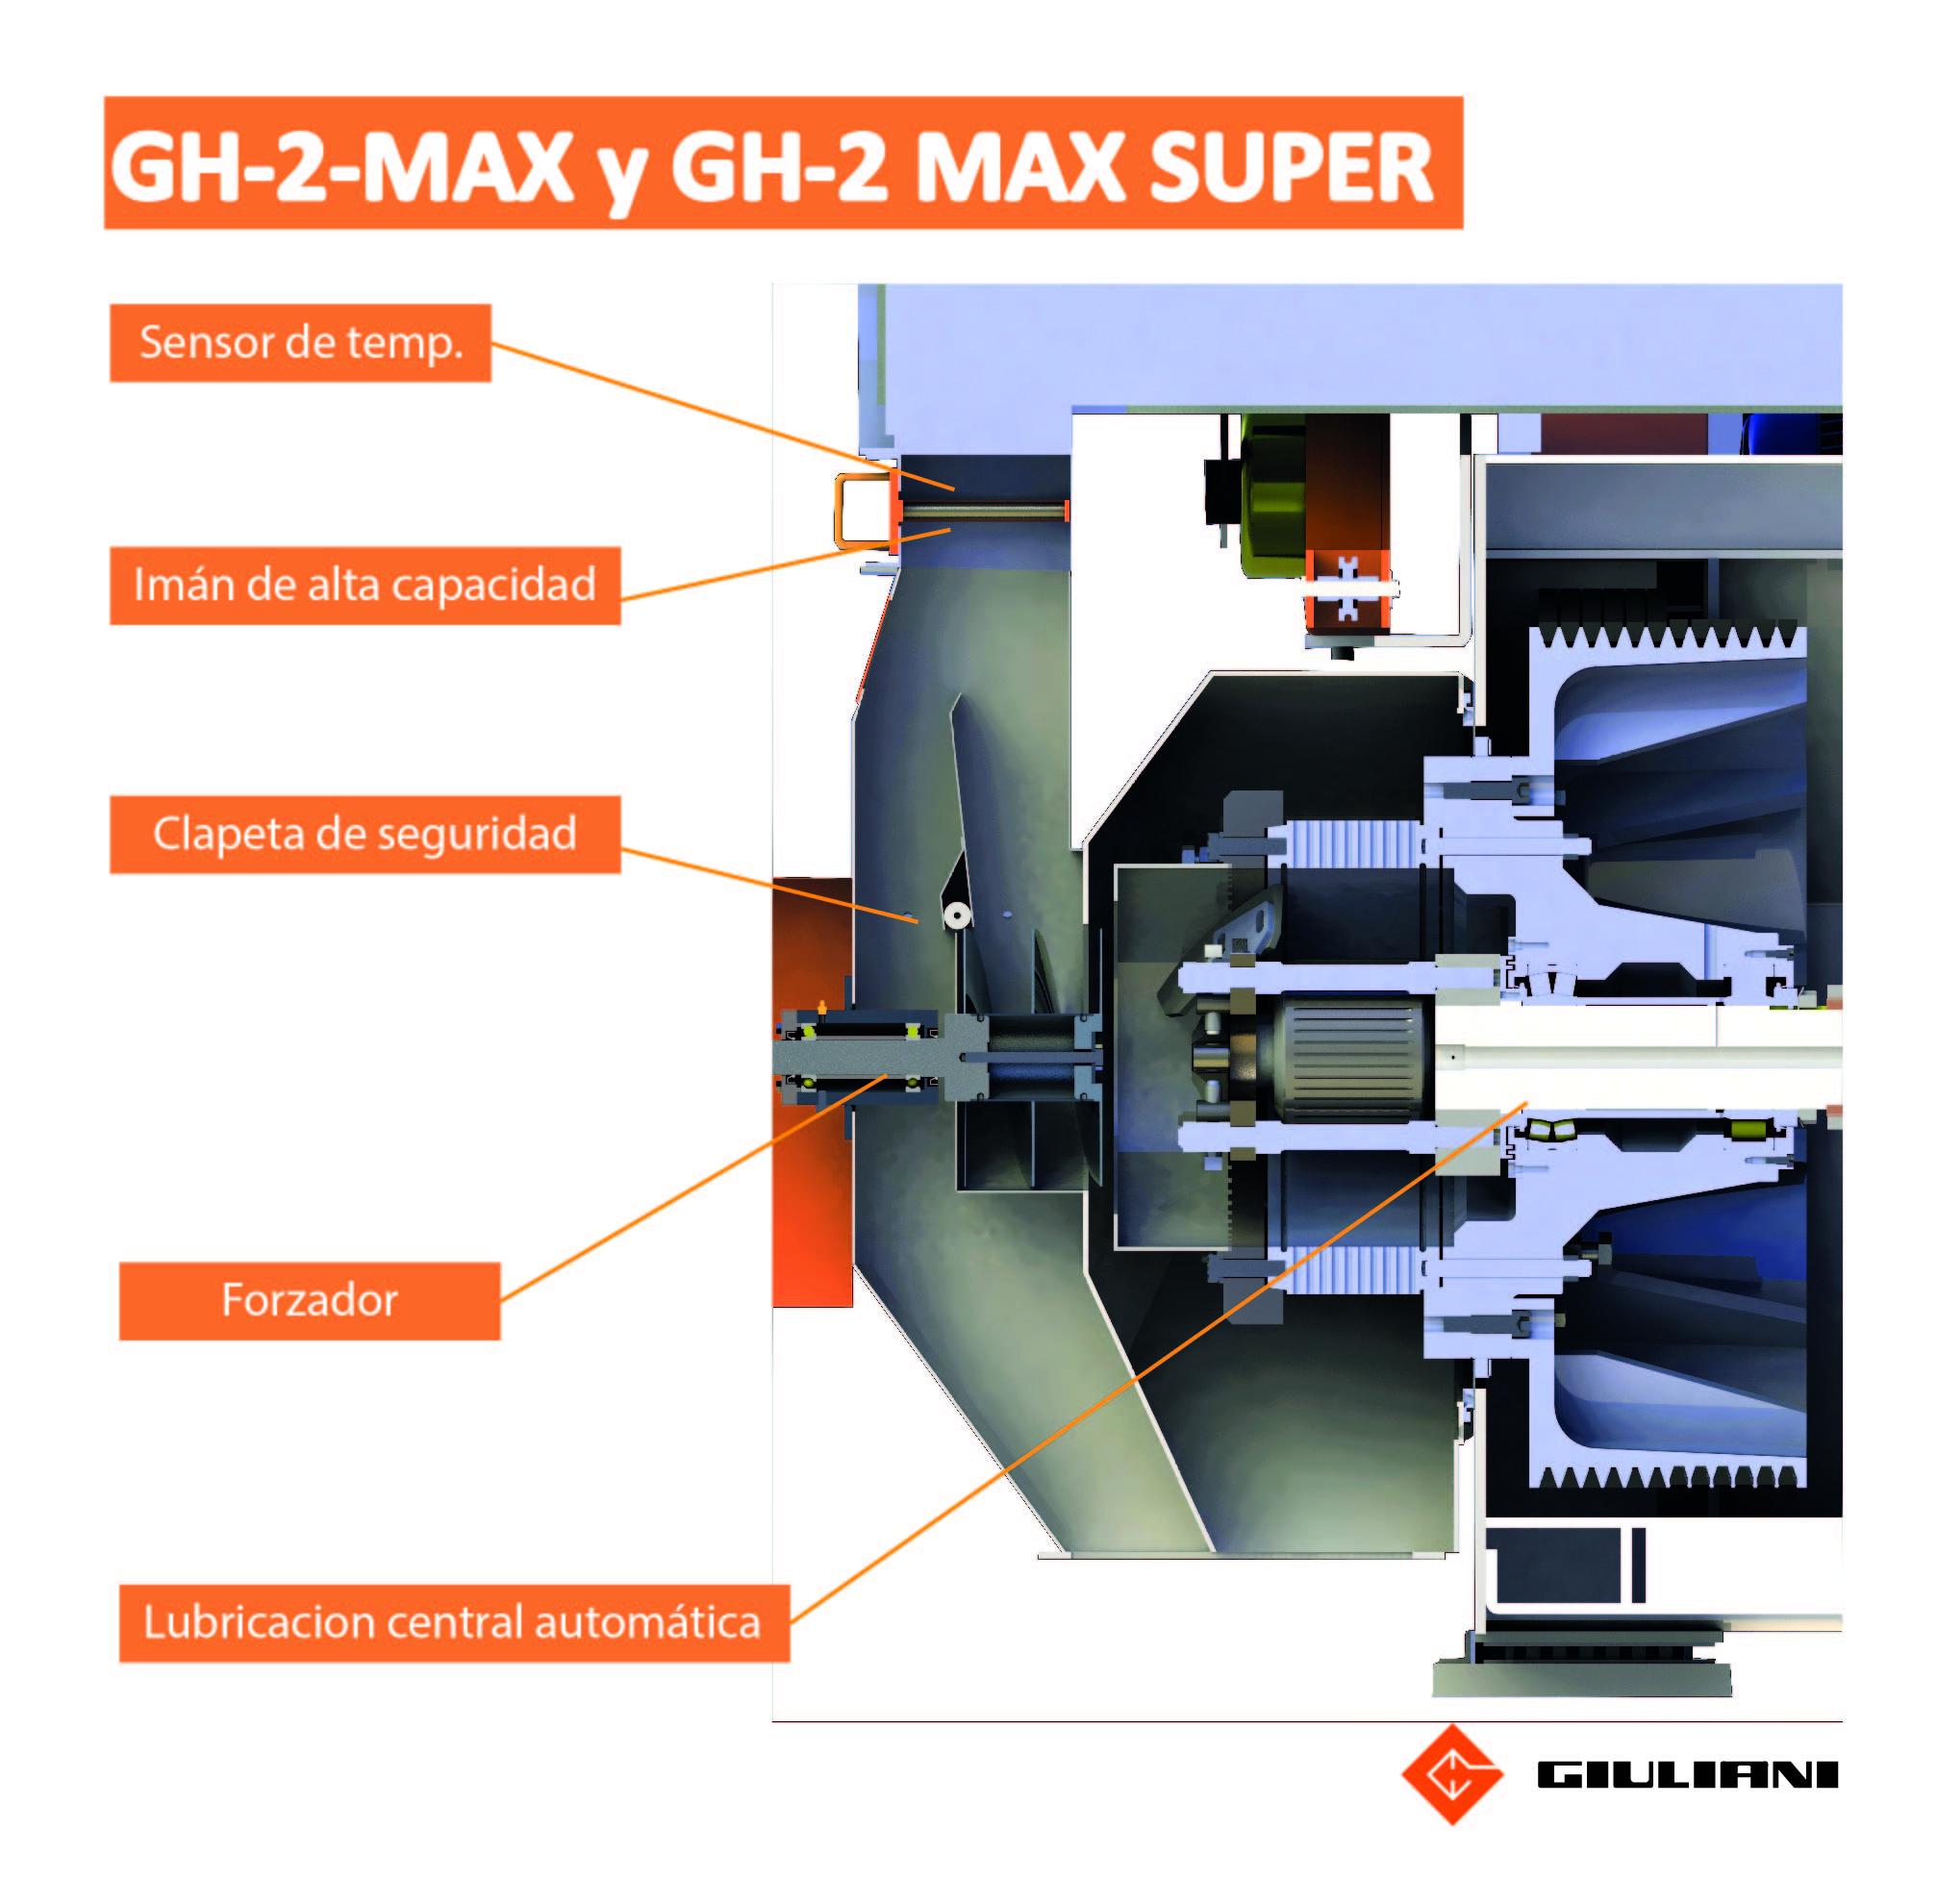 IMG_SL-GH-MAX_6